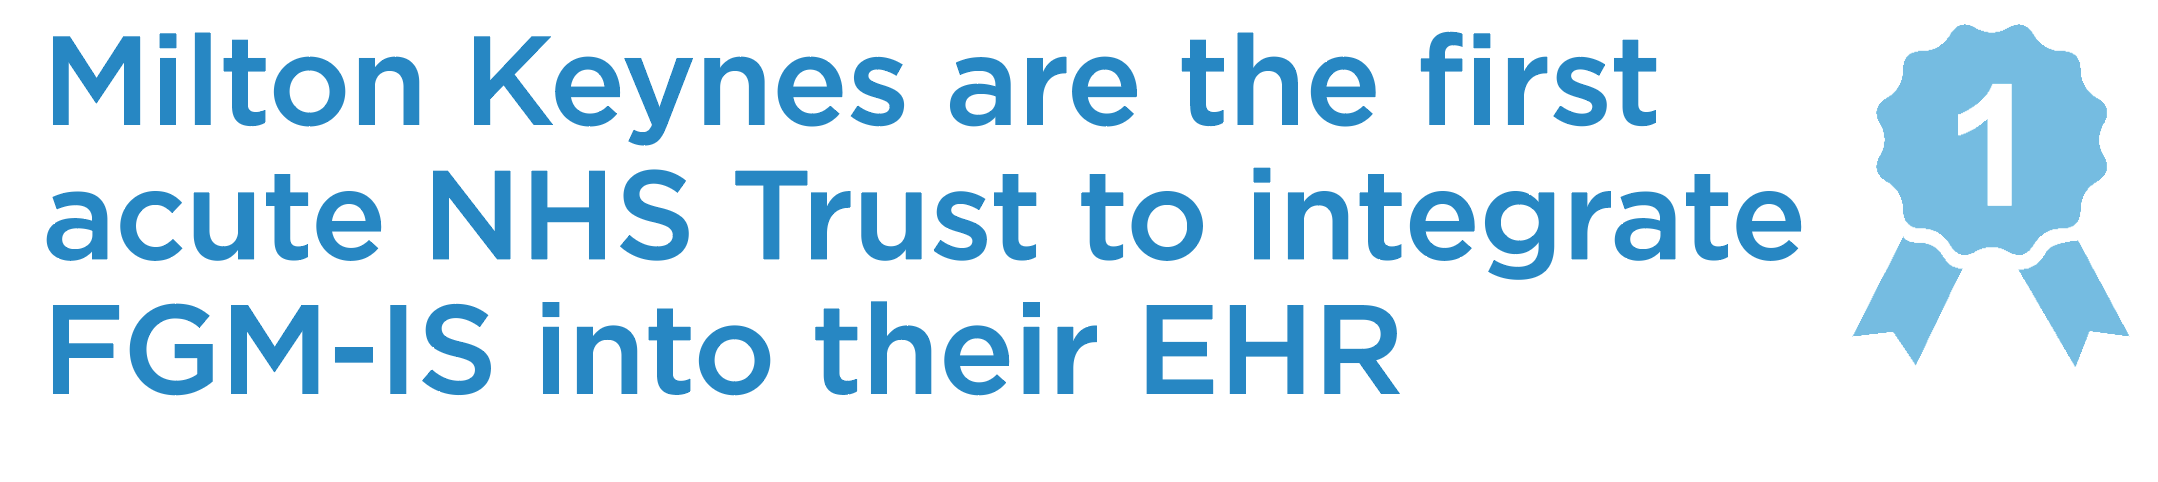 Milton Keynes University Hospital NHS Foundation Trust